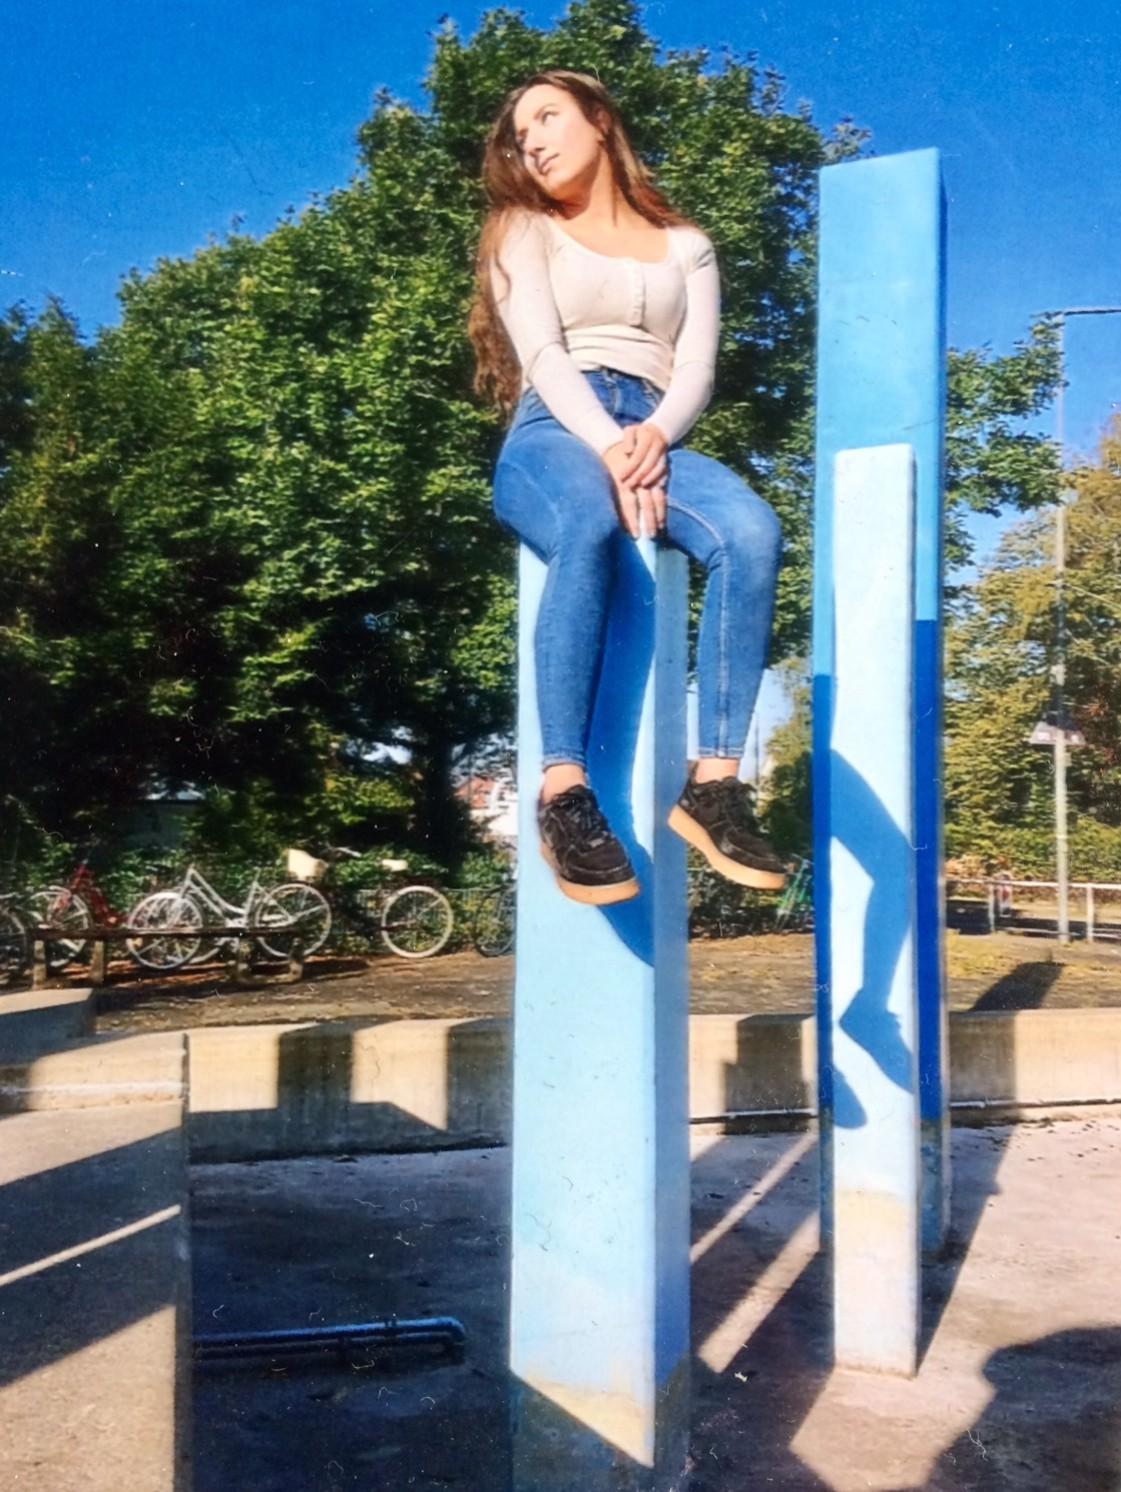 jugendkulturjahr-2020-ratingen-jkj2020-projekt-sich-zeigen-sich-verbergen